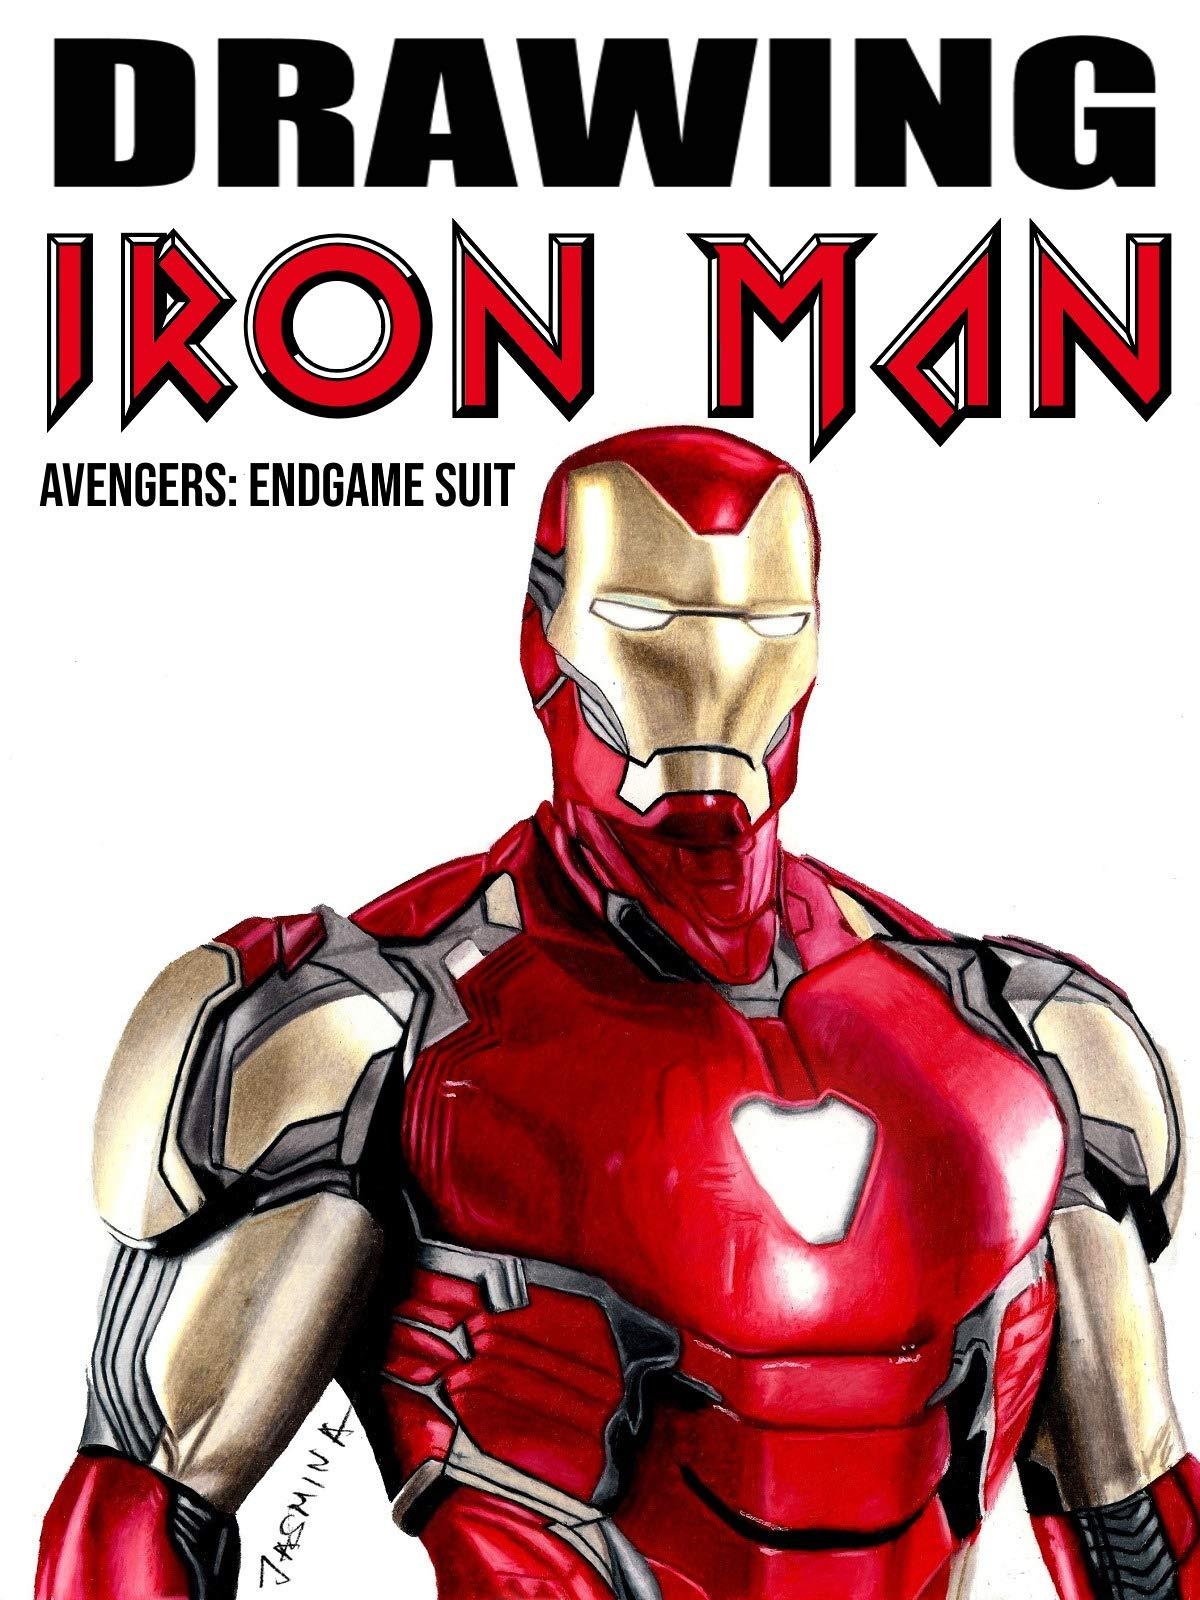 Iron Man Tie Clip Marvel Inspired